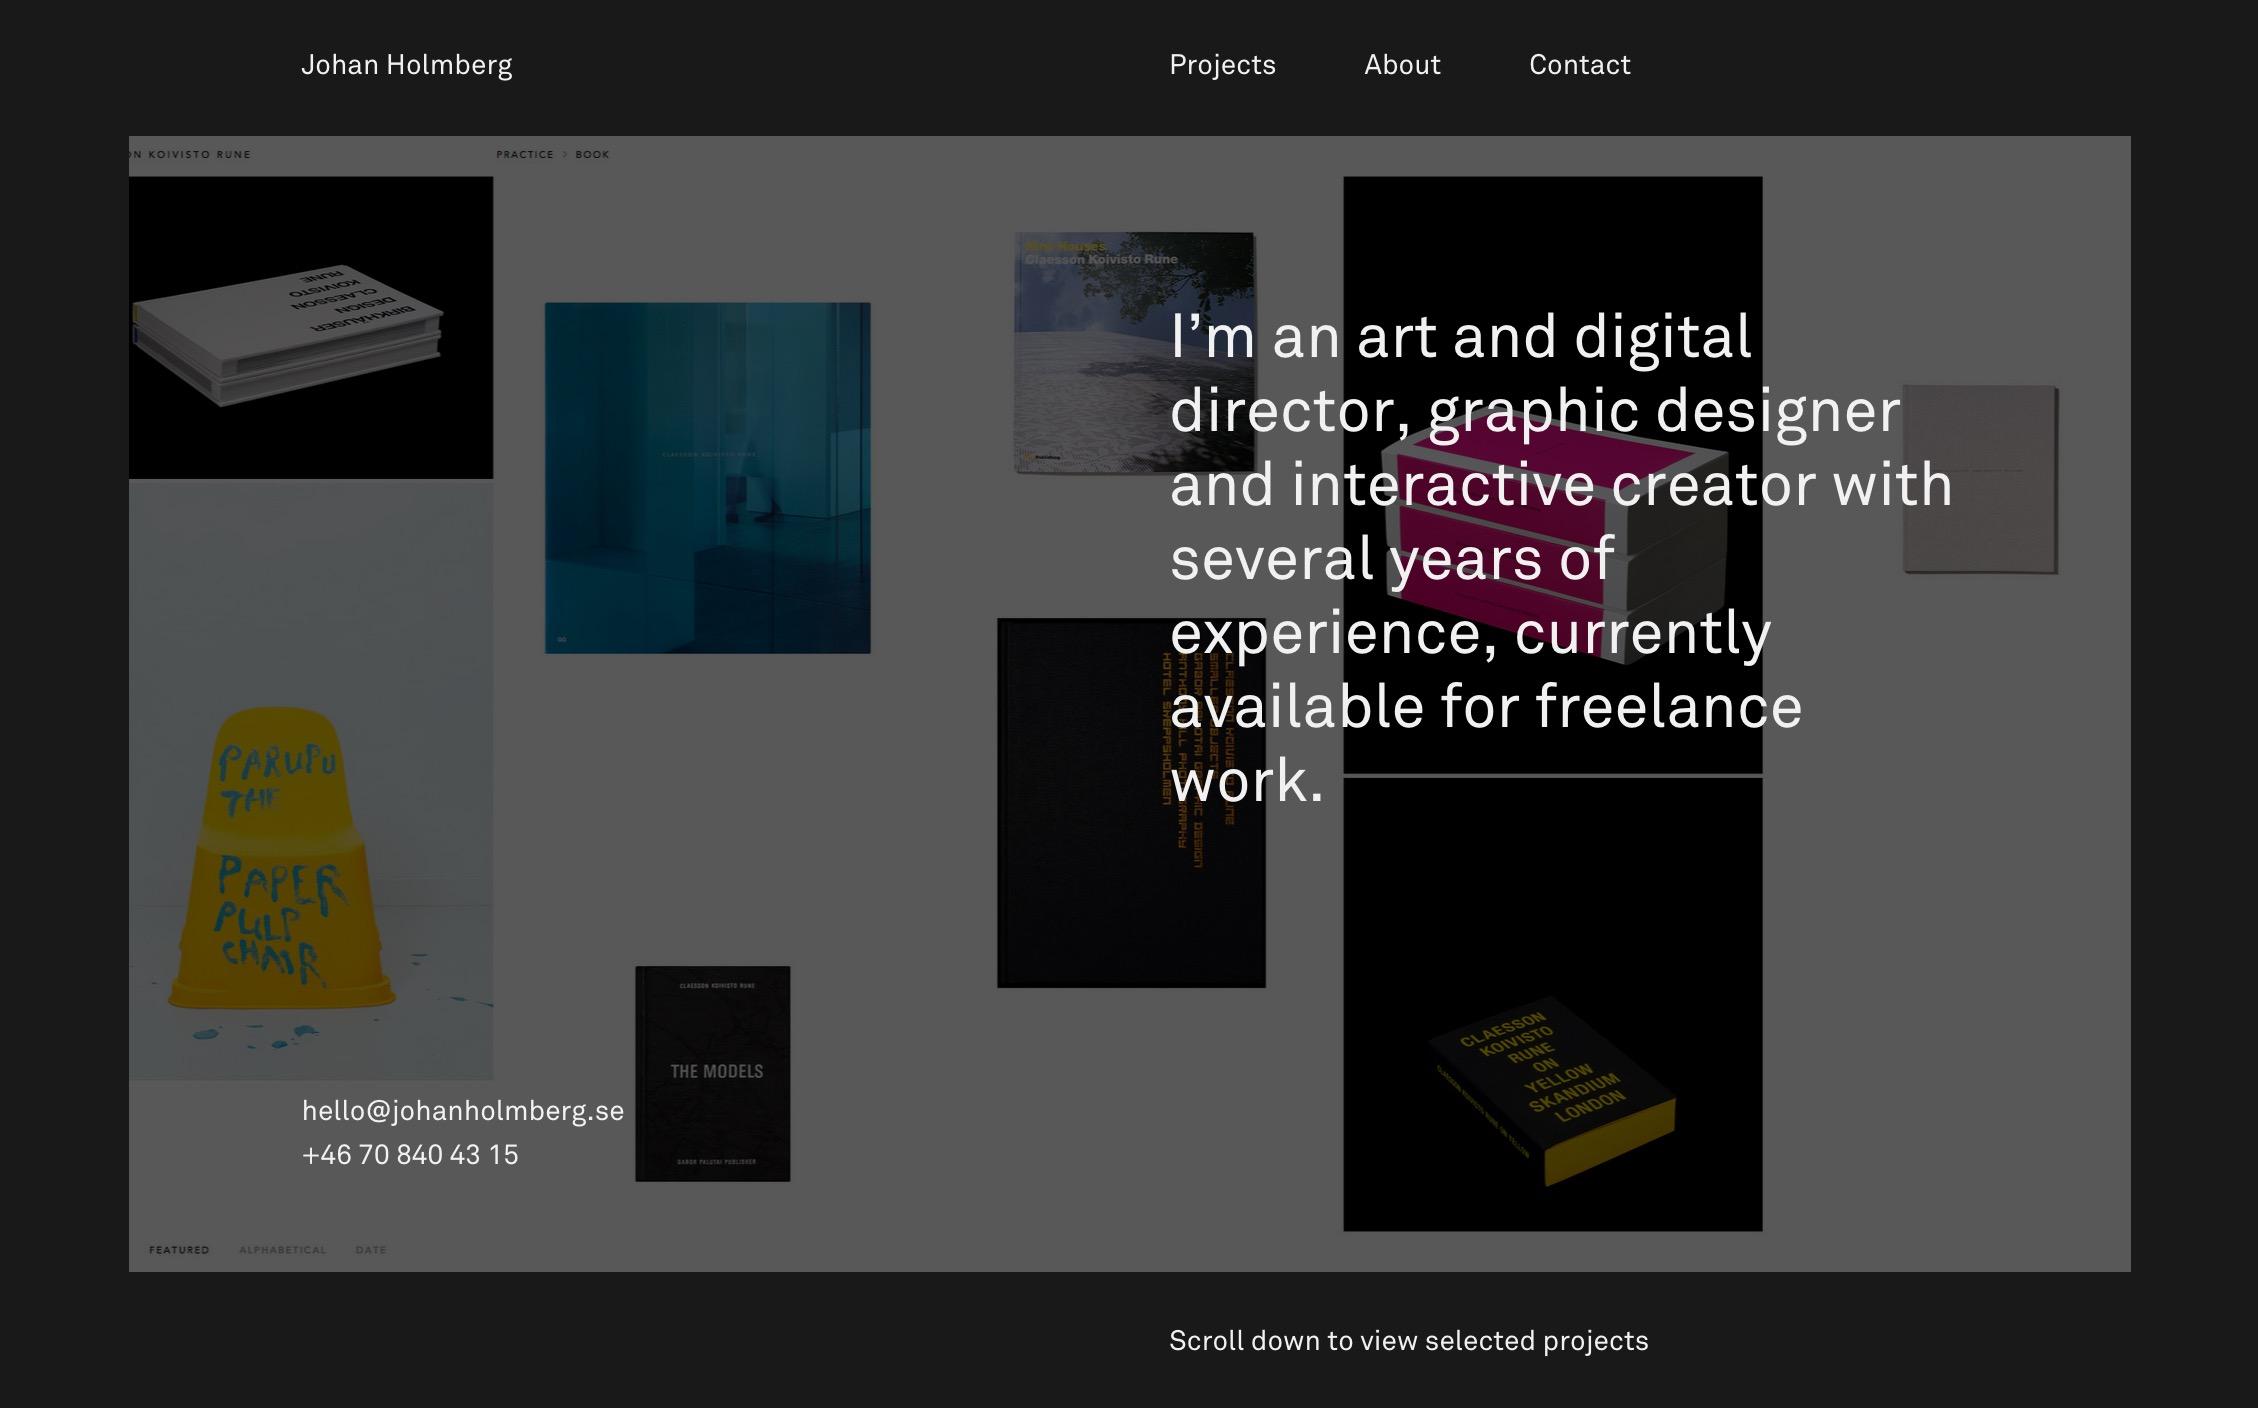 Johan Holmberg –Art and digital director  graphic designer and interactive creator